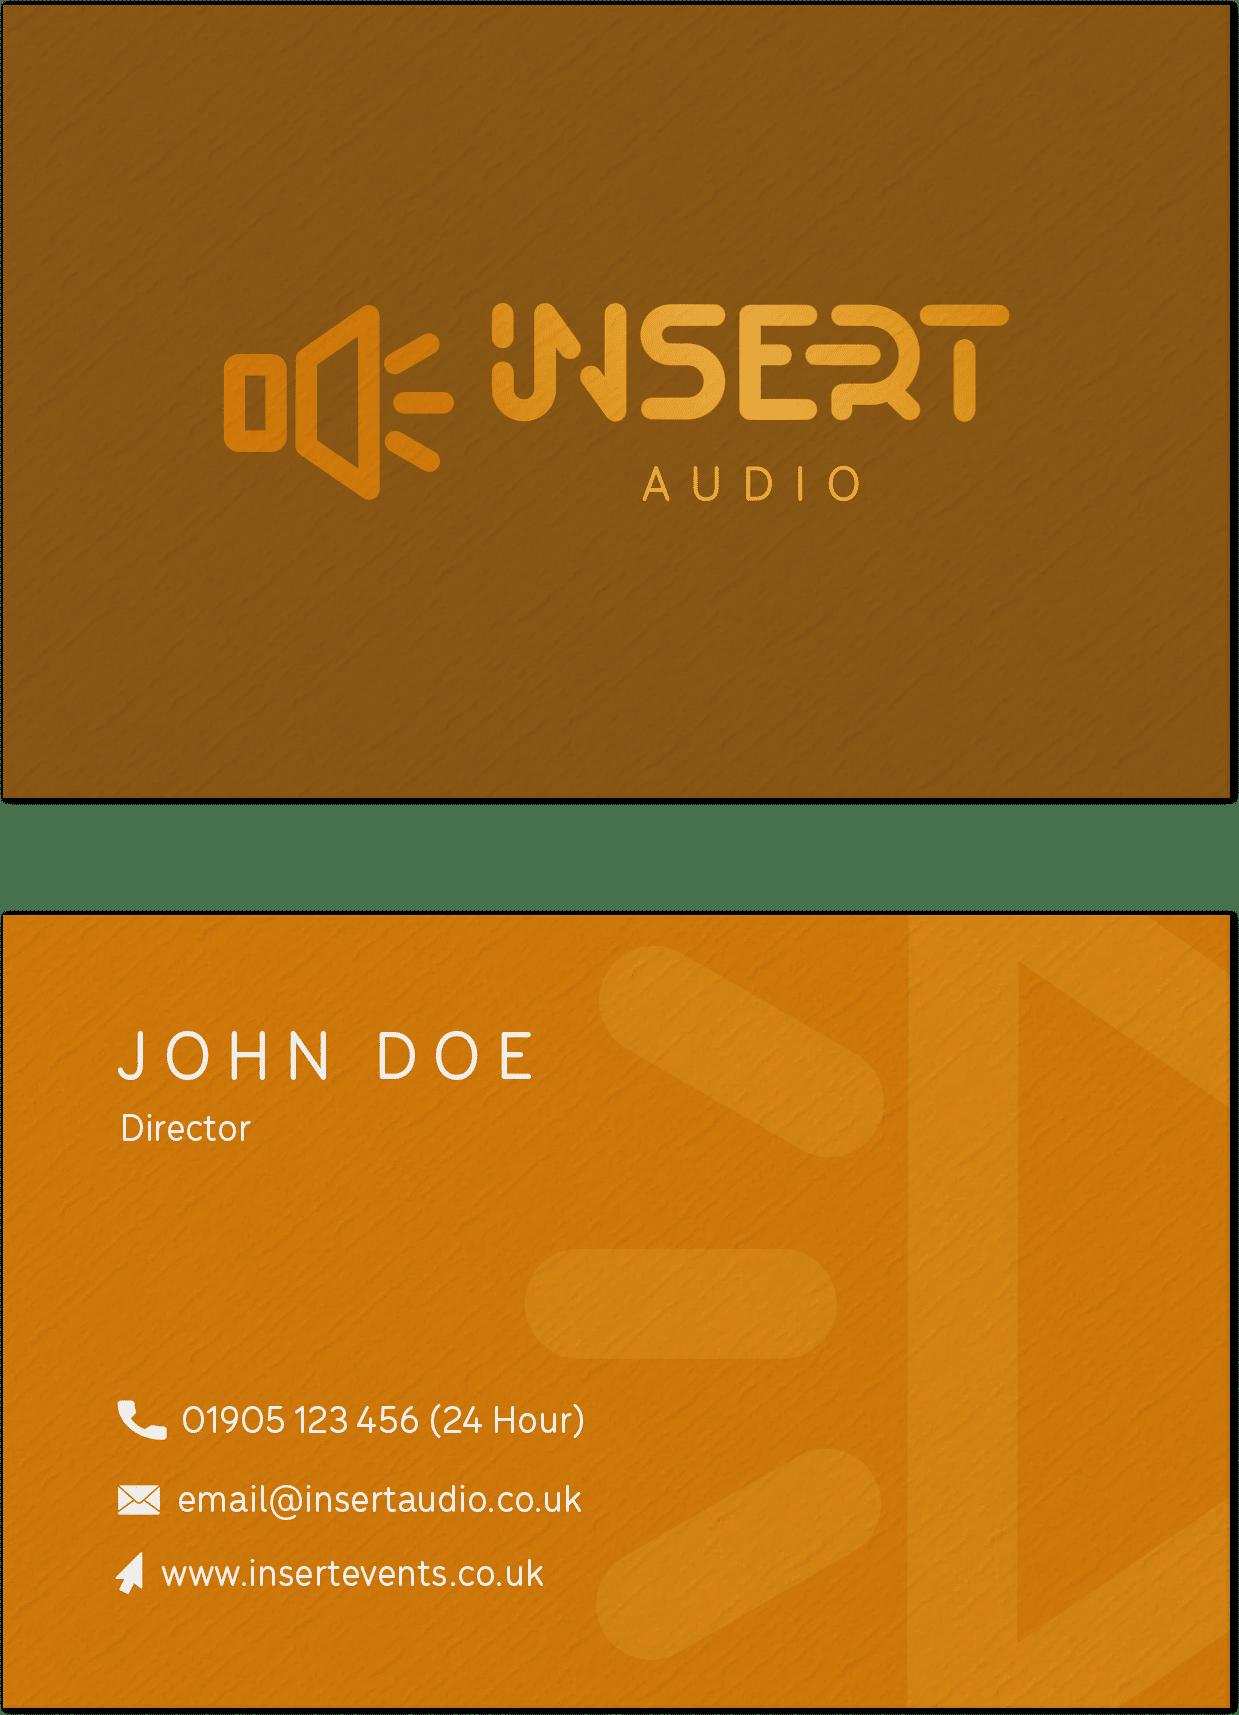 insert audio yellow business cards mockup